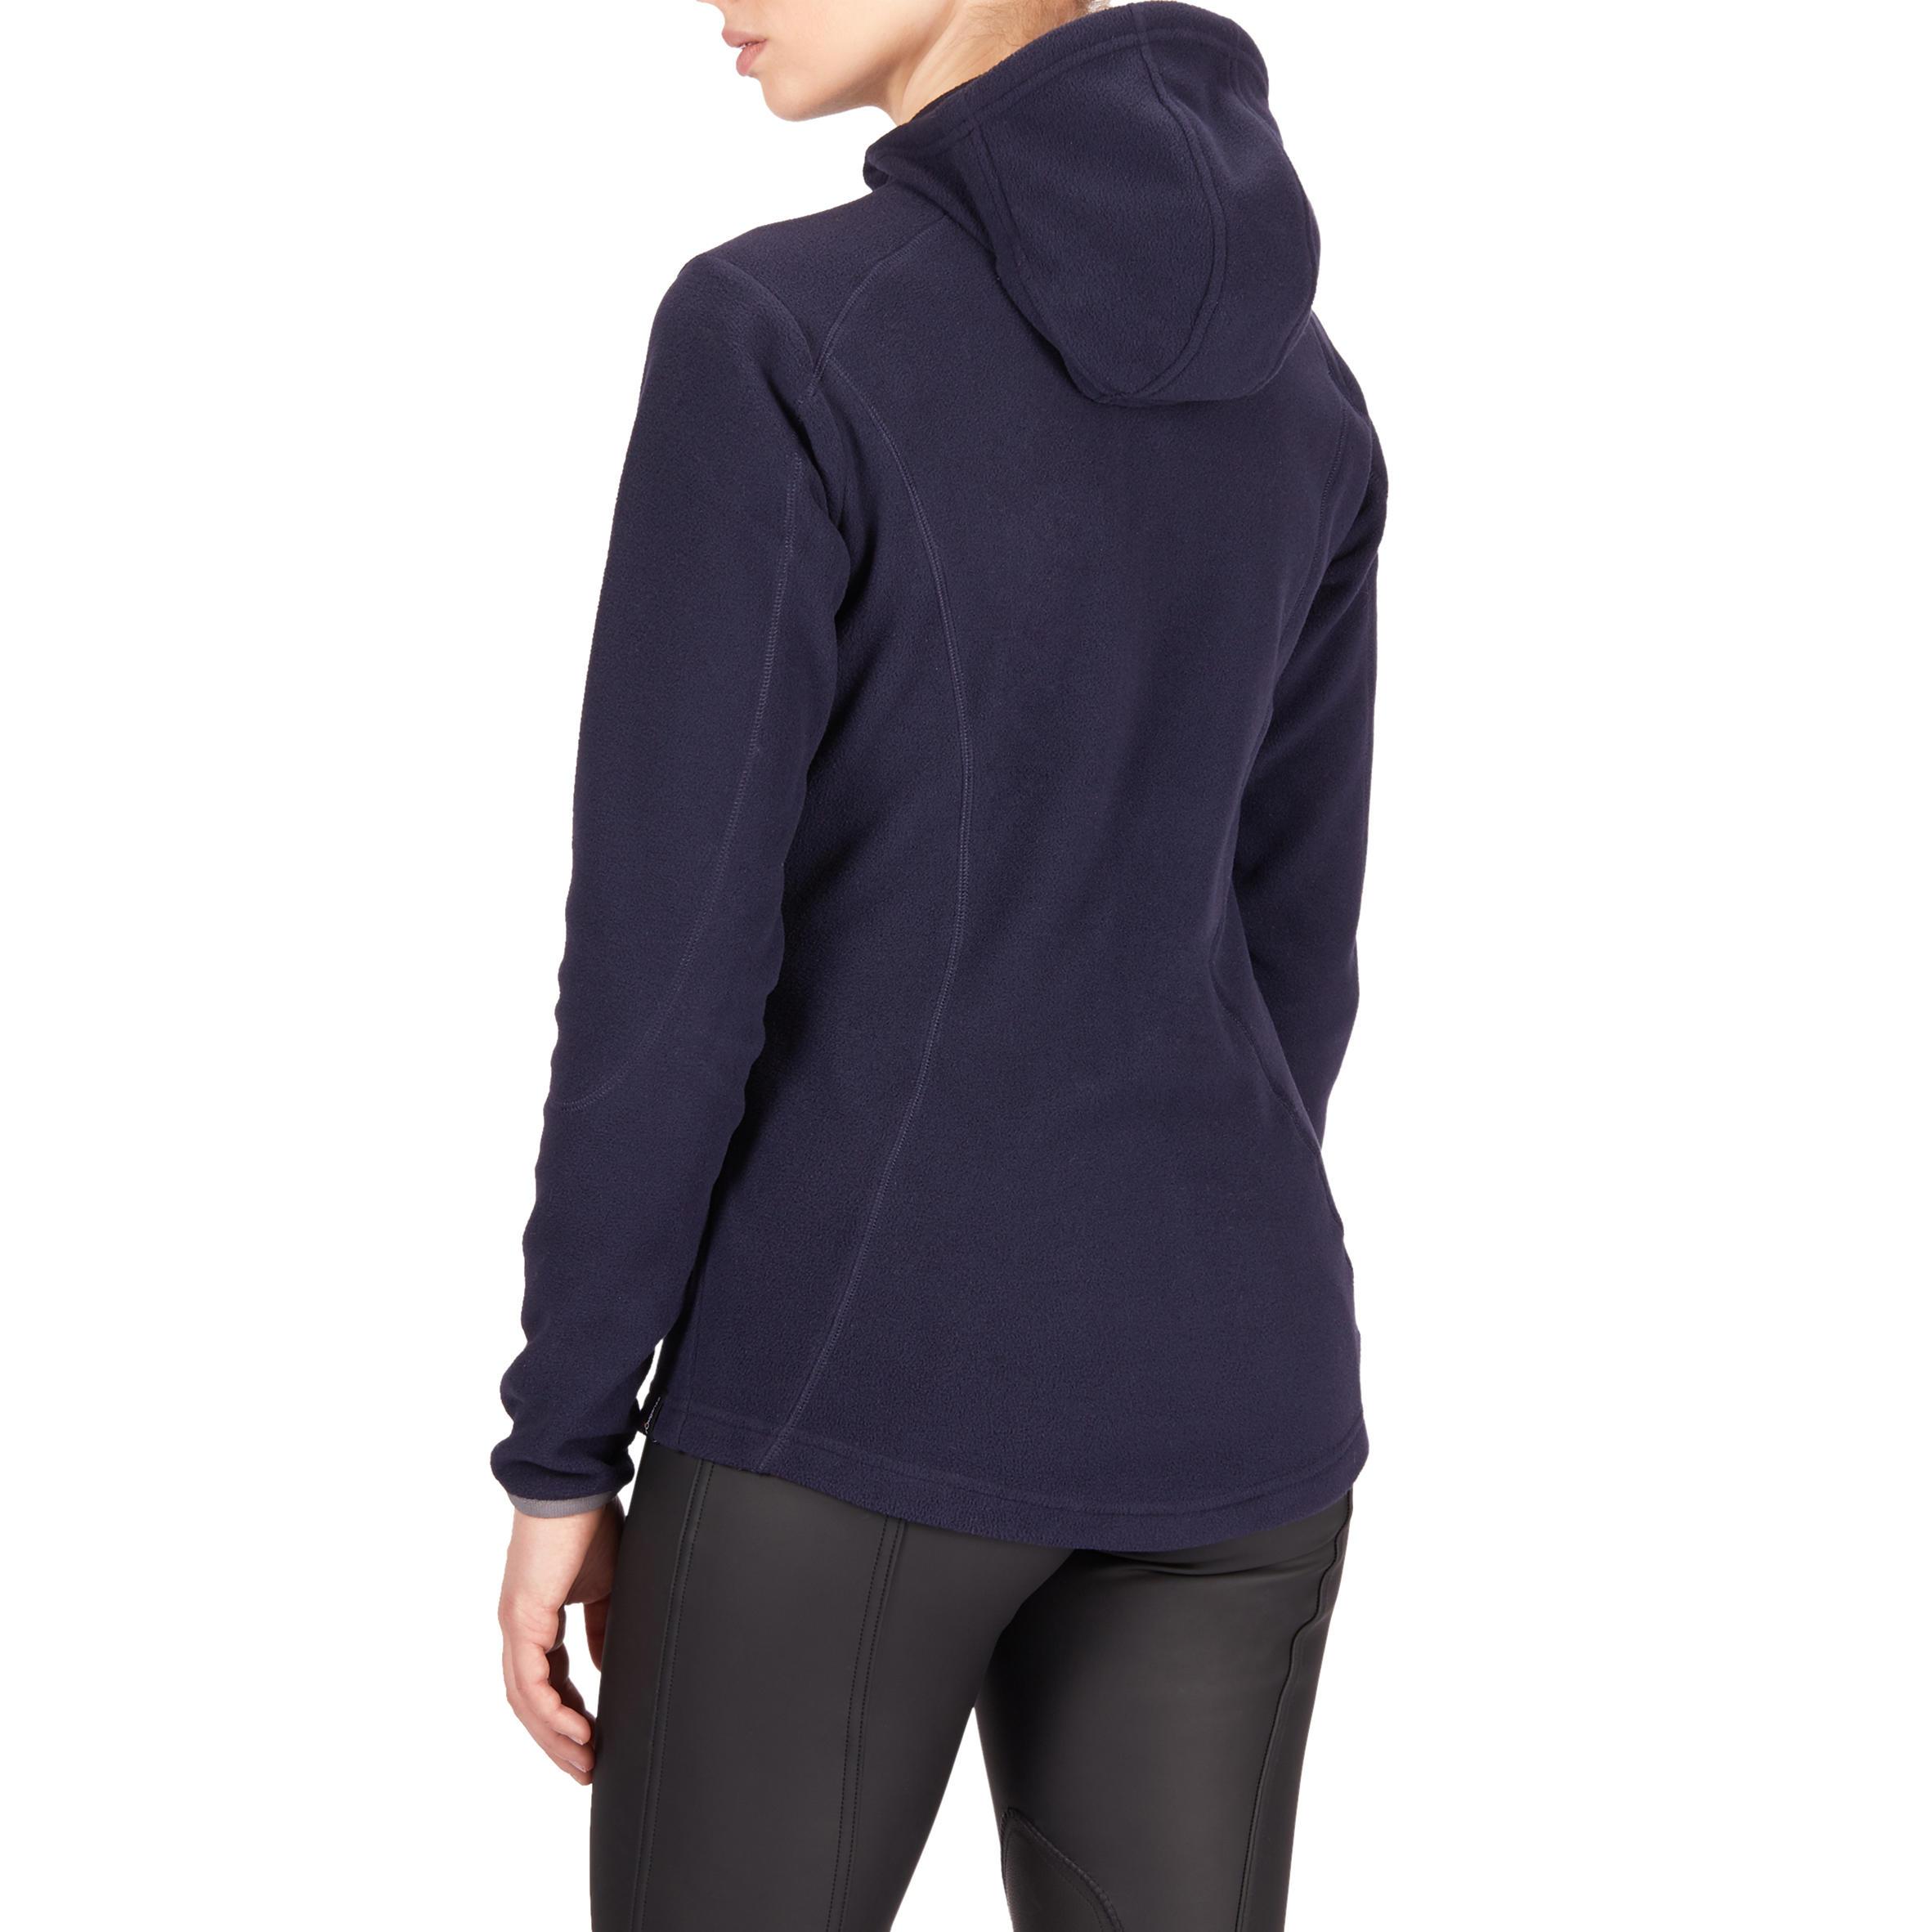 Women's Horseback Riding Hooded 2-In-1 Fleece Sweater - Navy